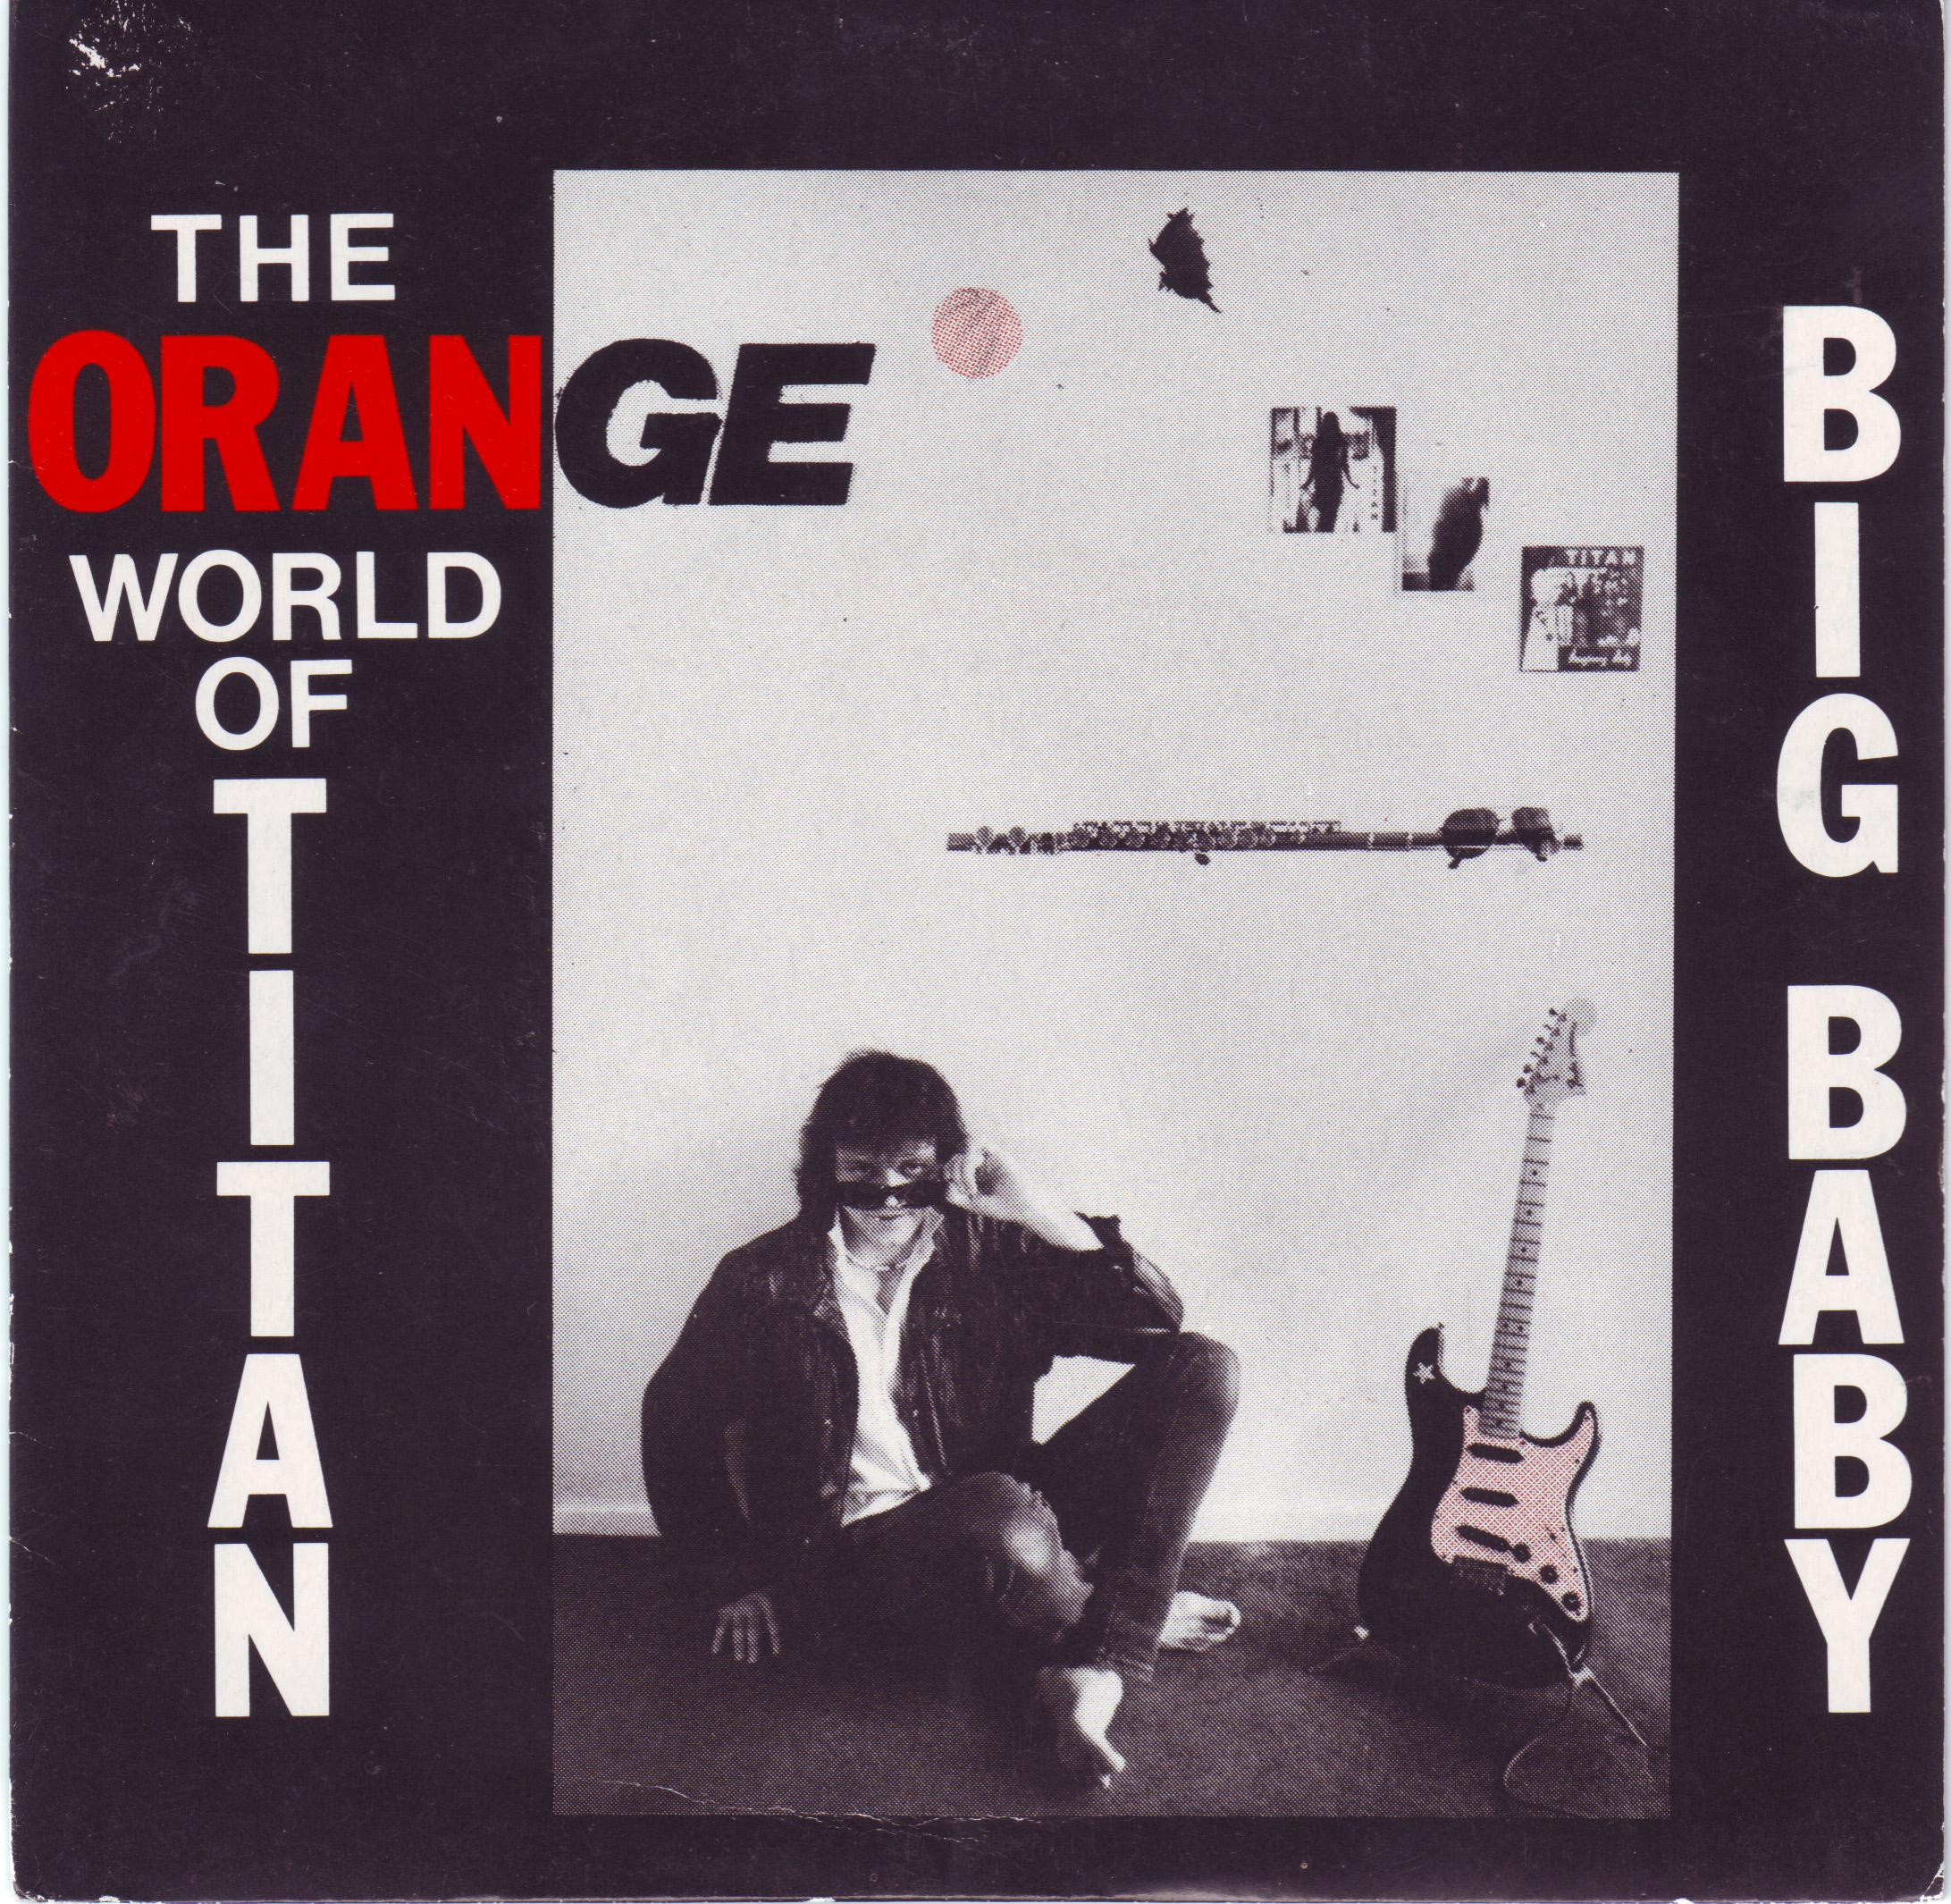 Orange World Of Titan - Big Baby